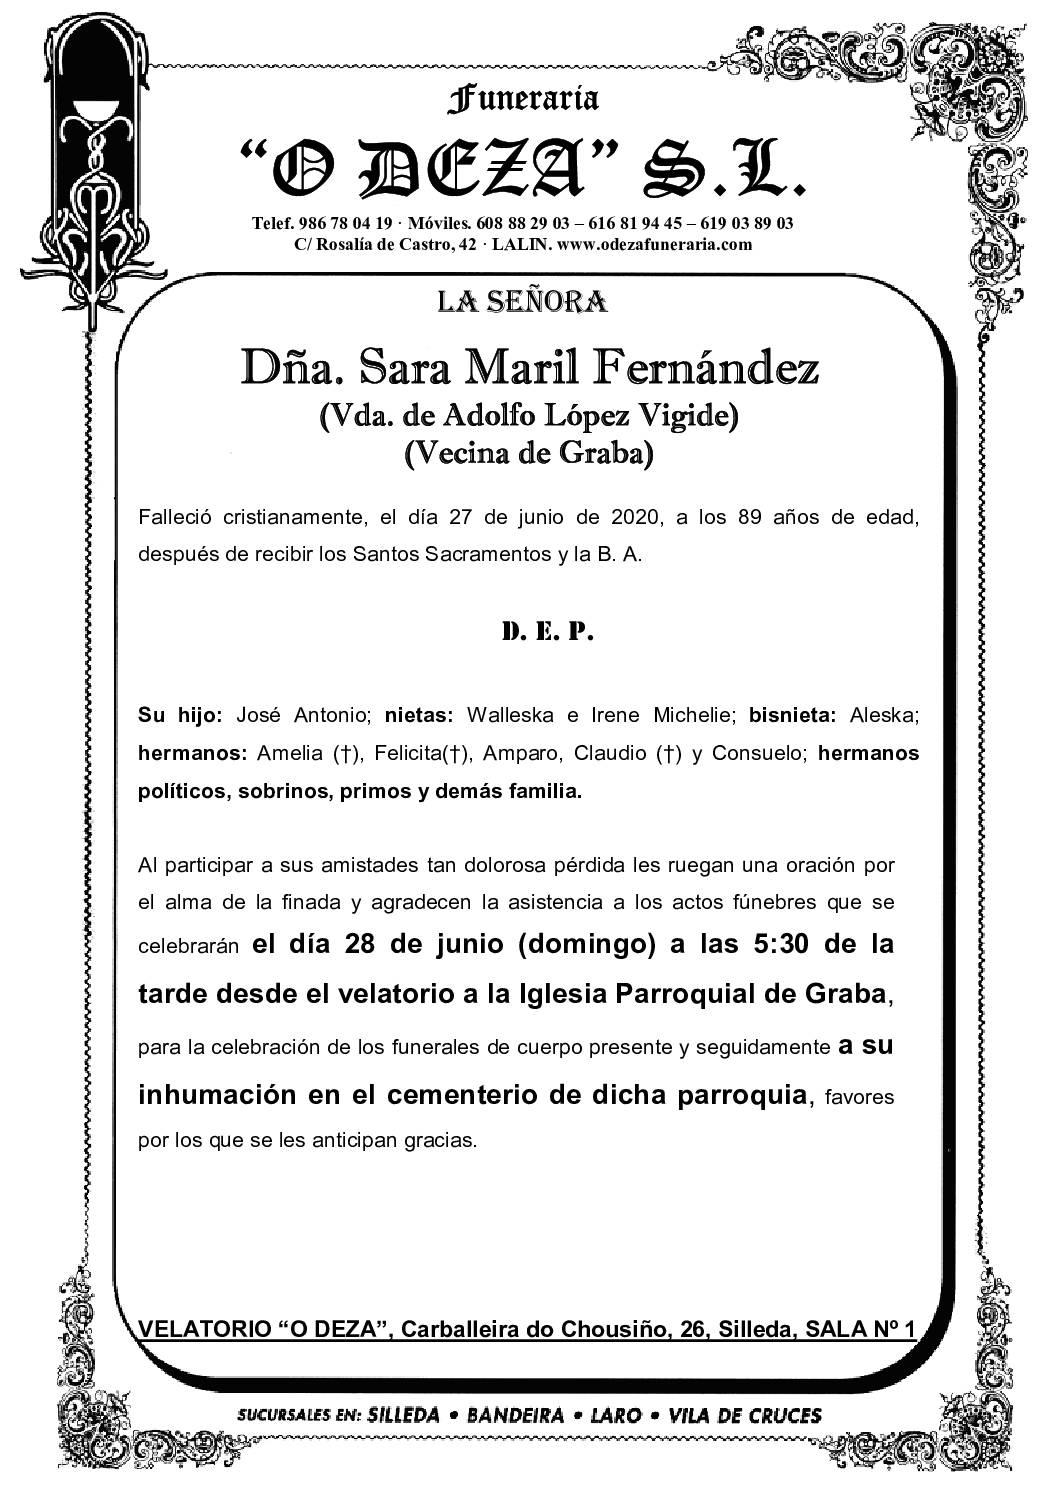 DÑA. SARA MARIL FERNÁNDEZ